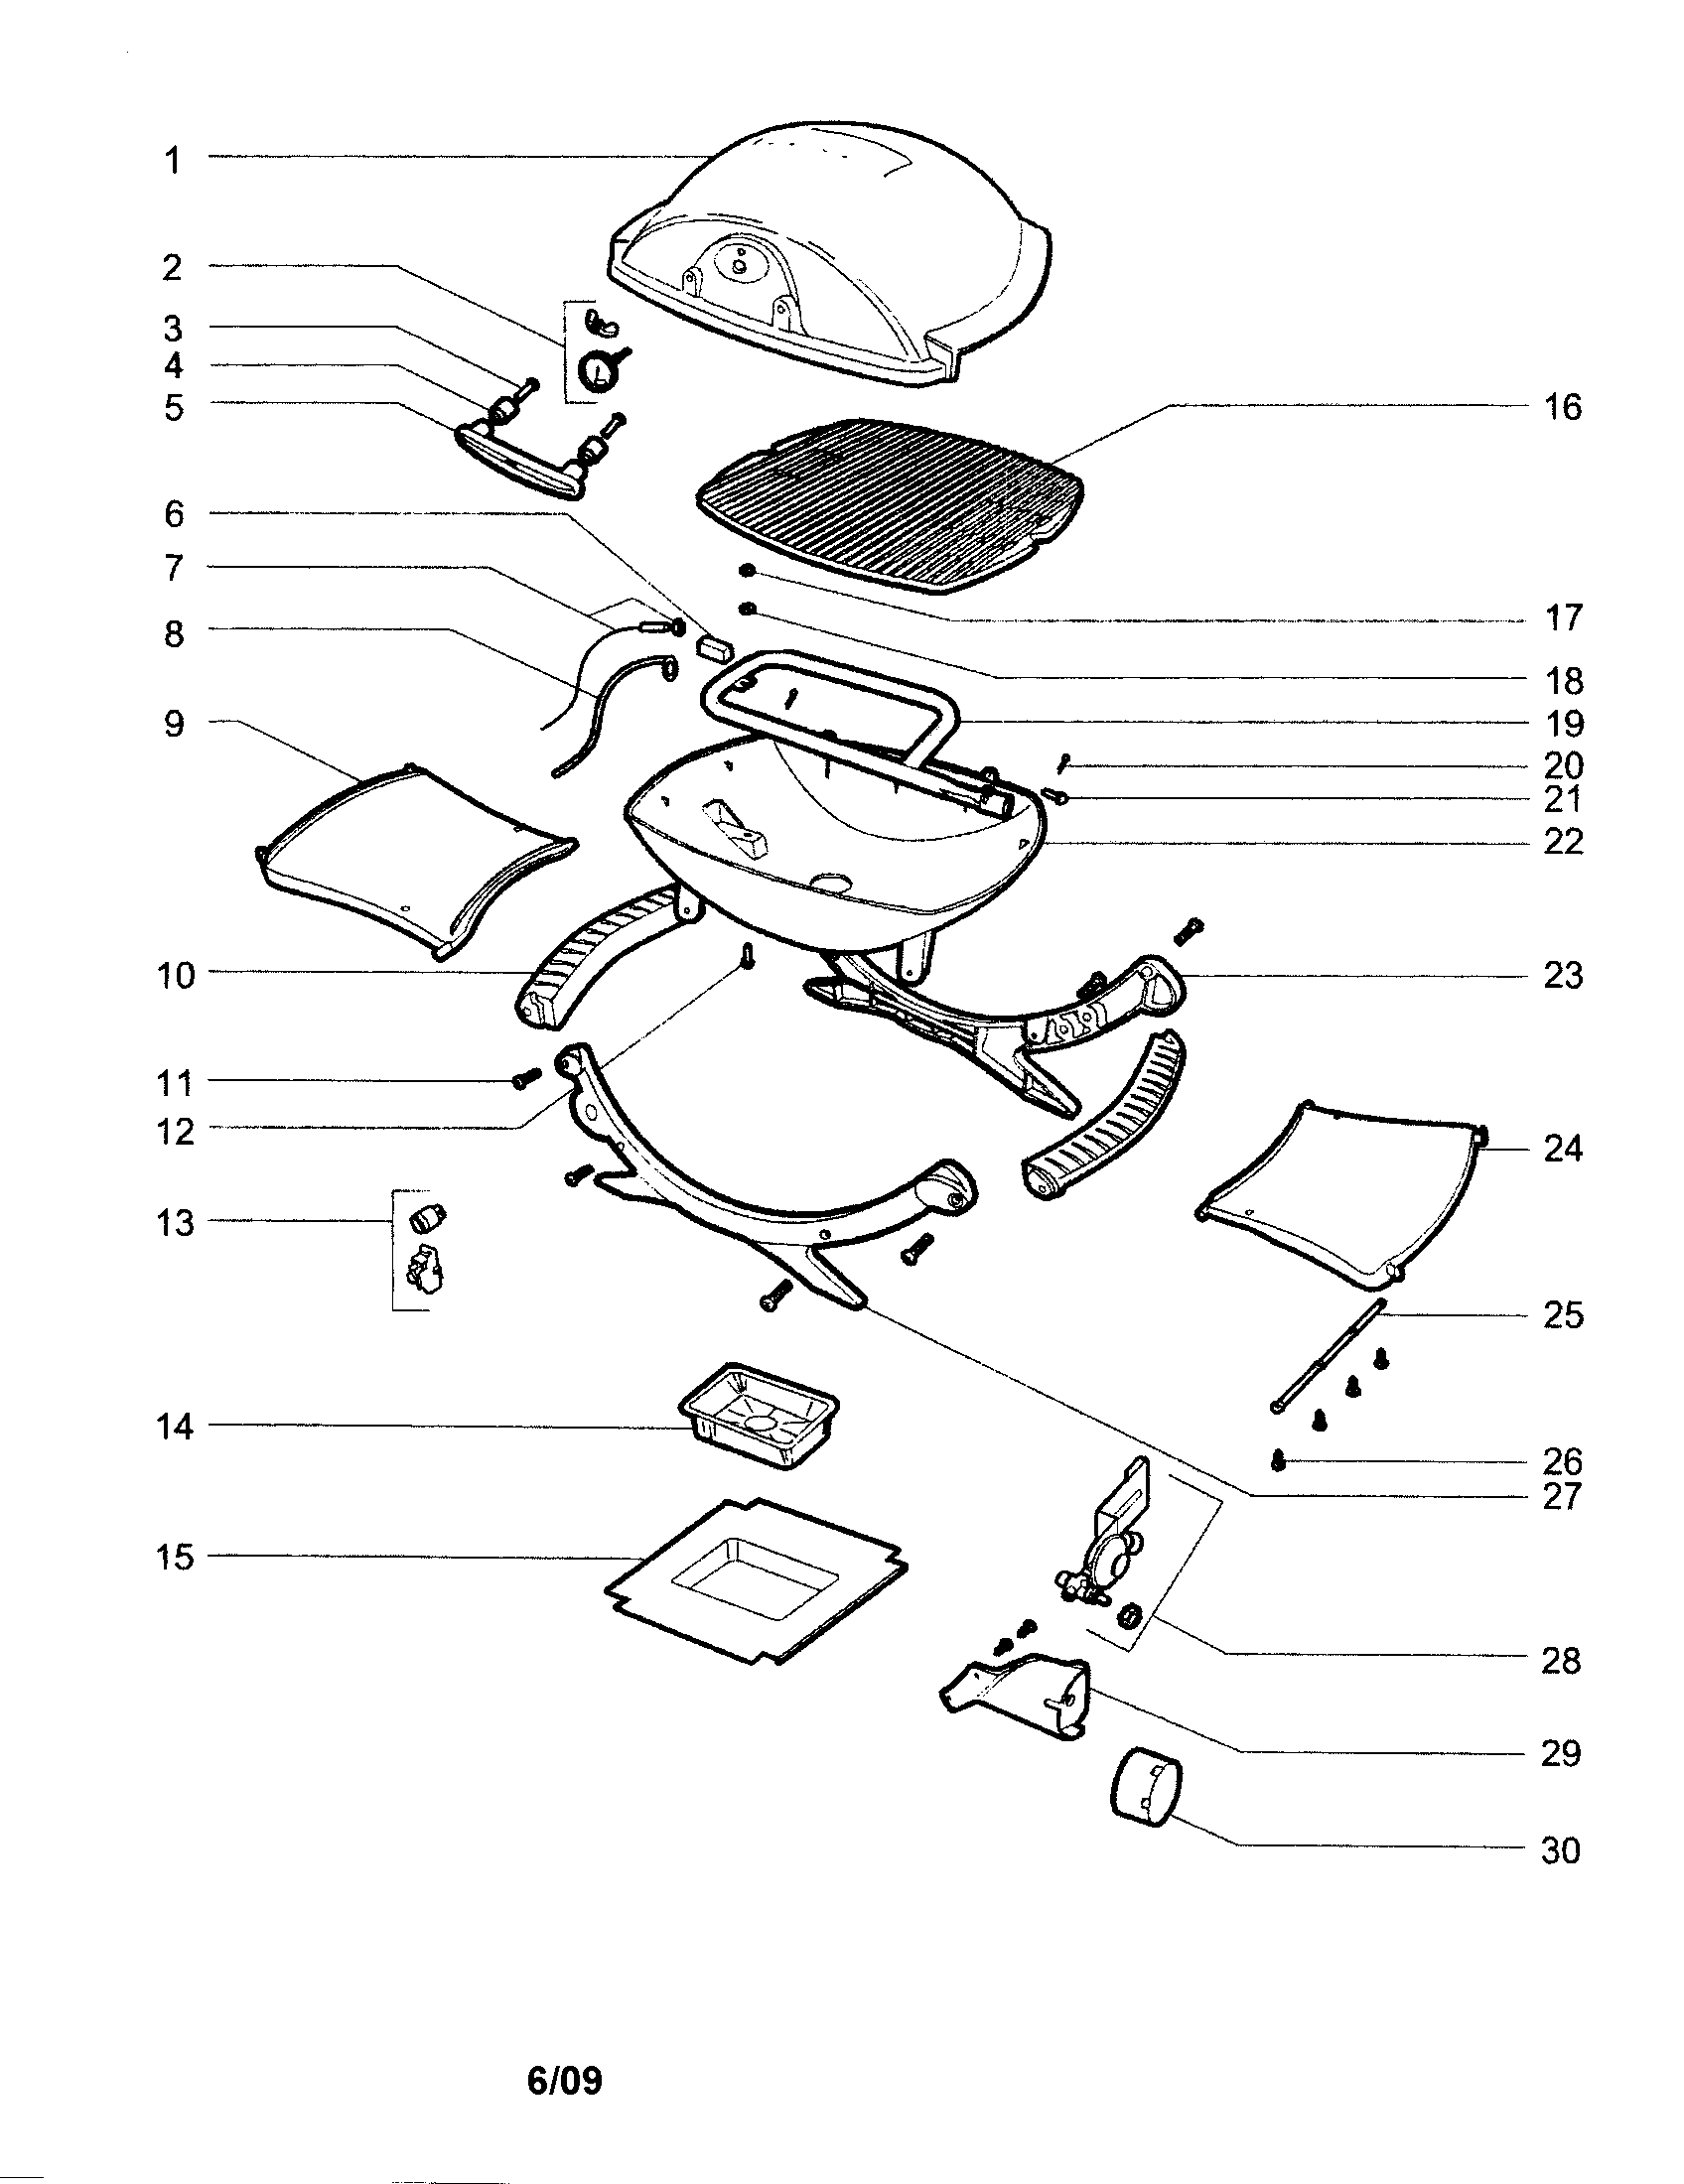 weber grill instruction booklet